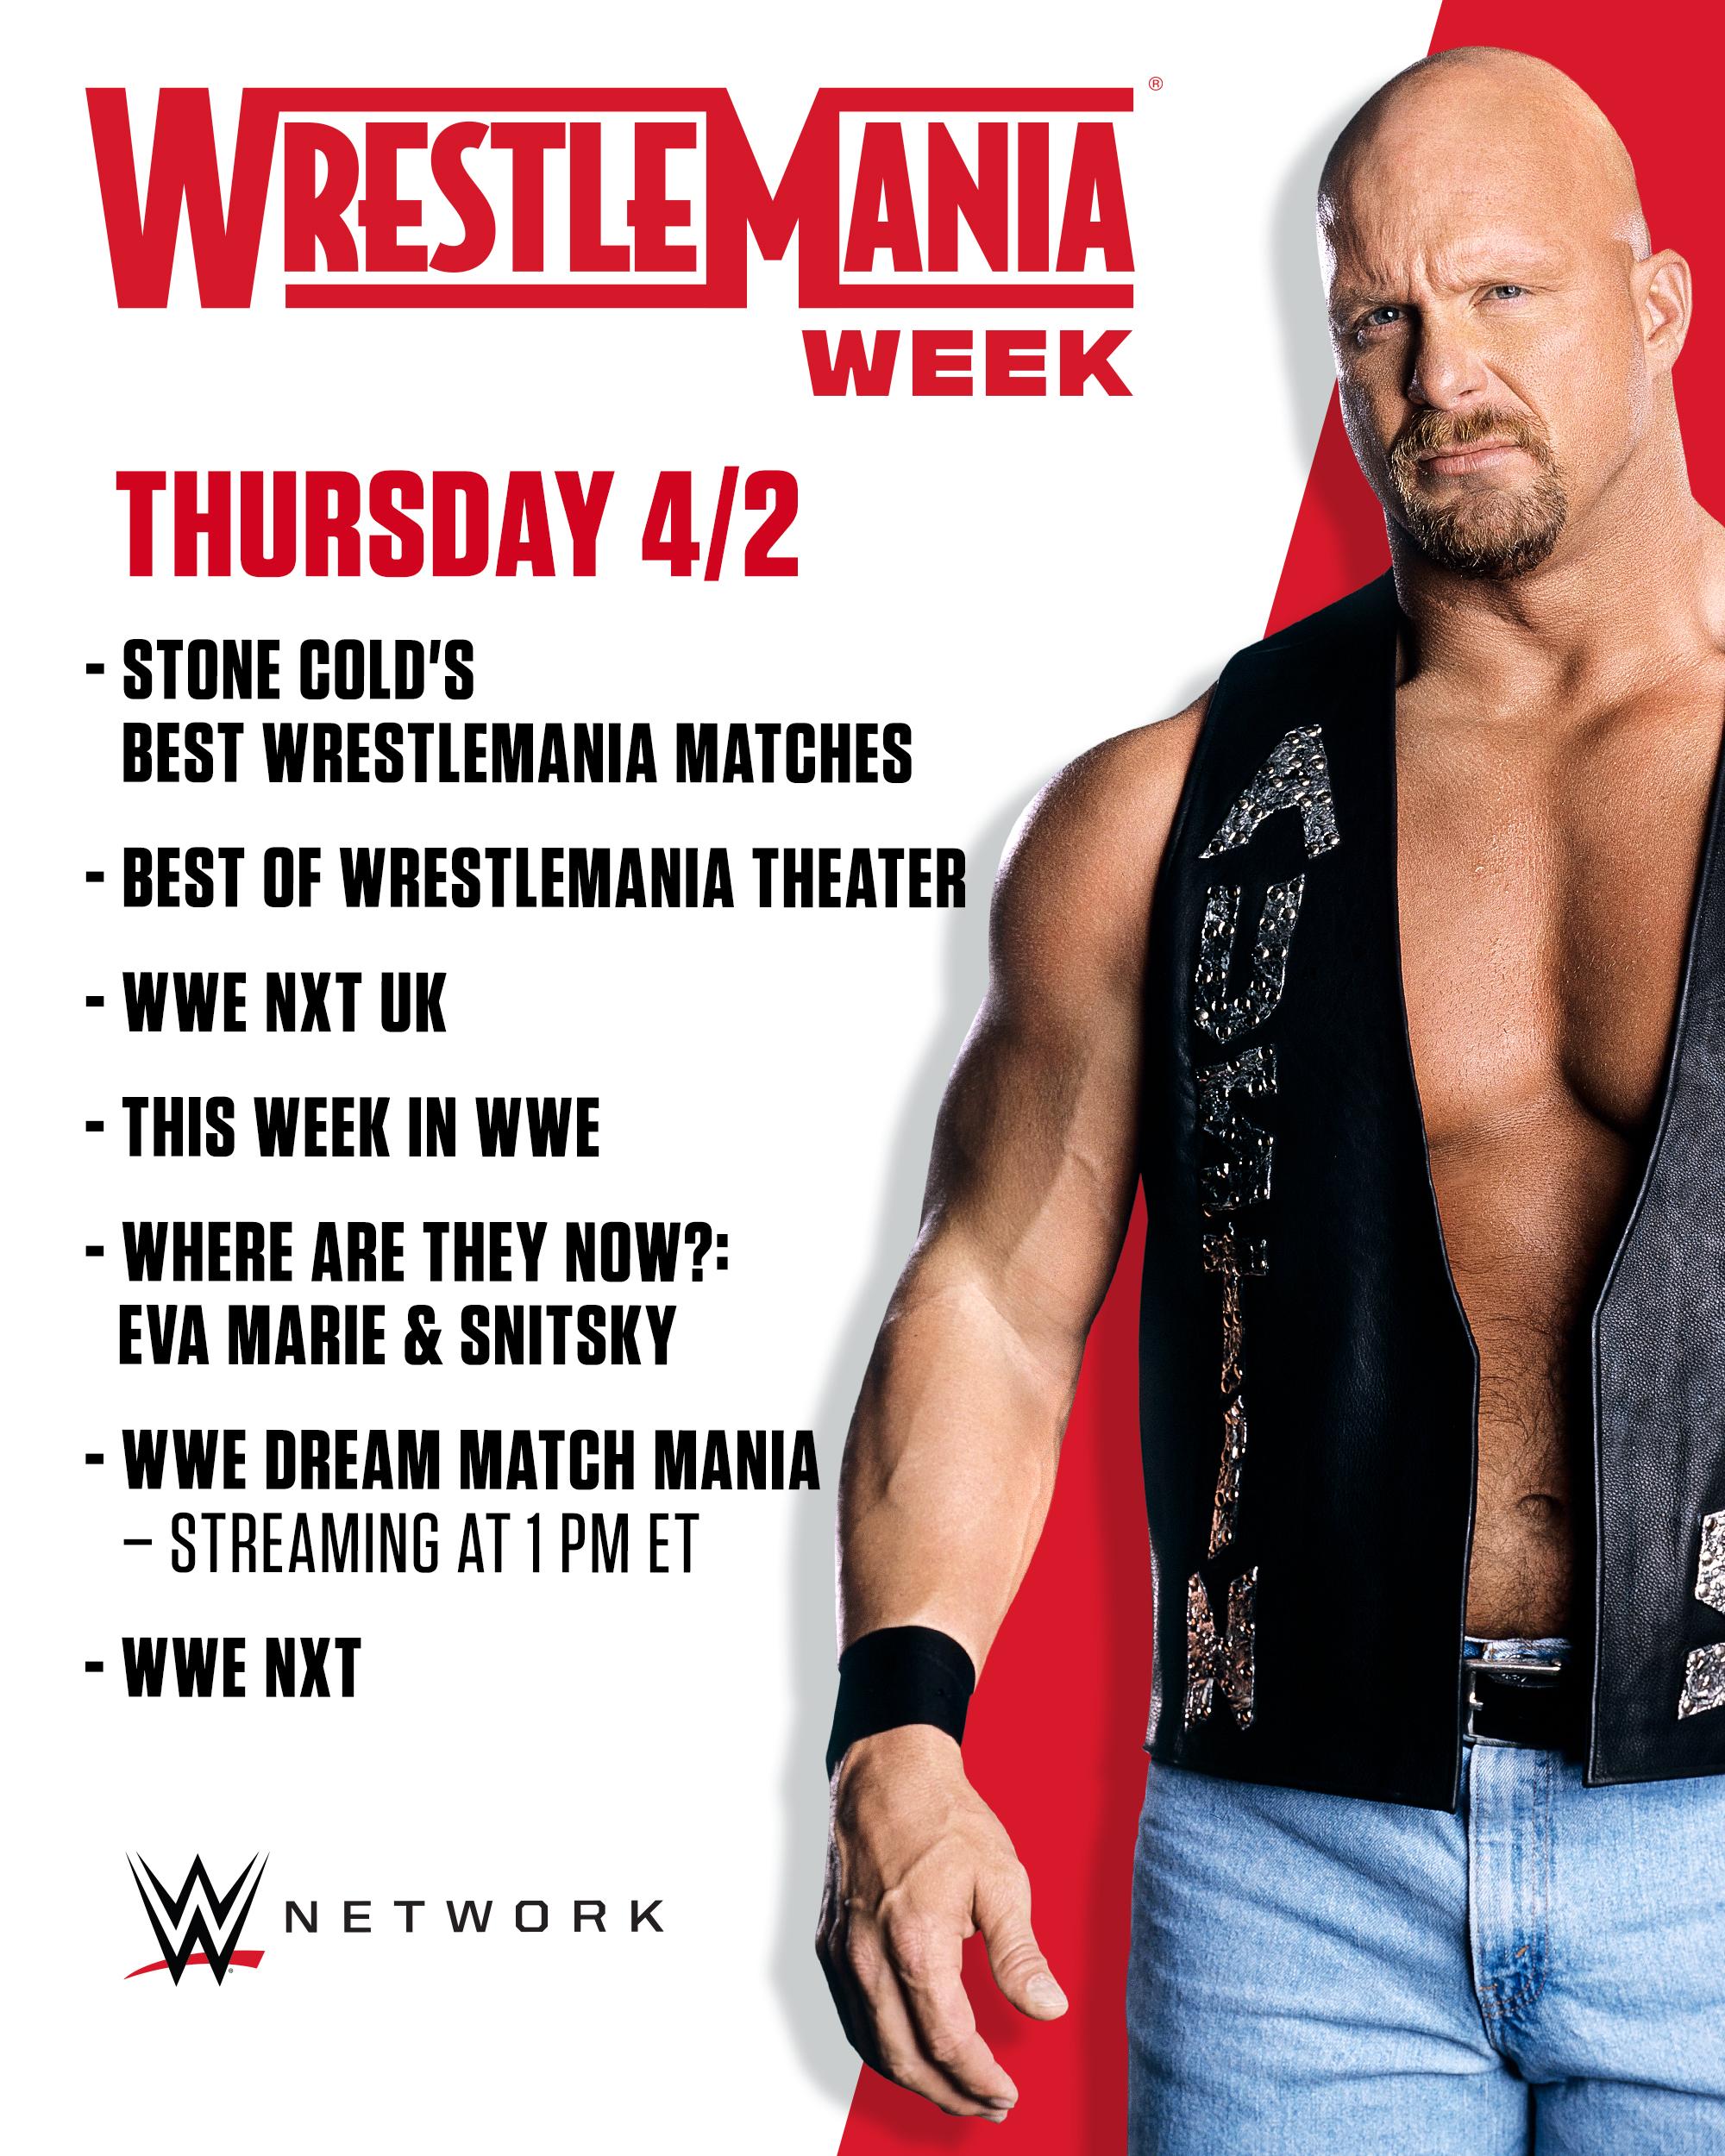 Wrestlemania Week Announced On WWE Network; List Of Programs Revealed 4